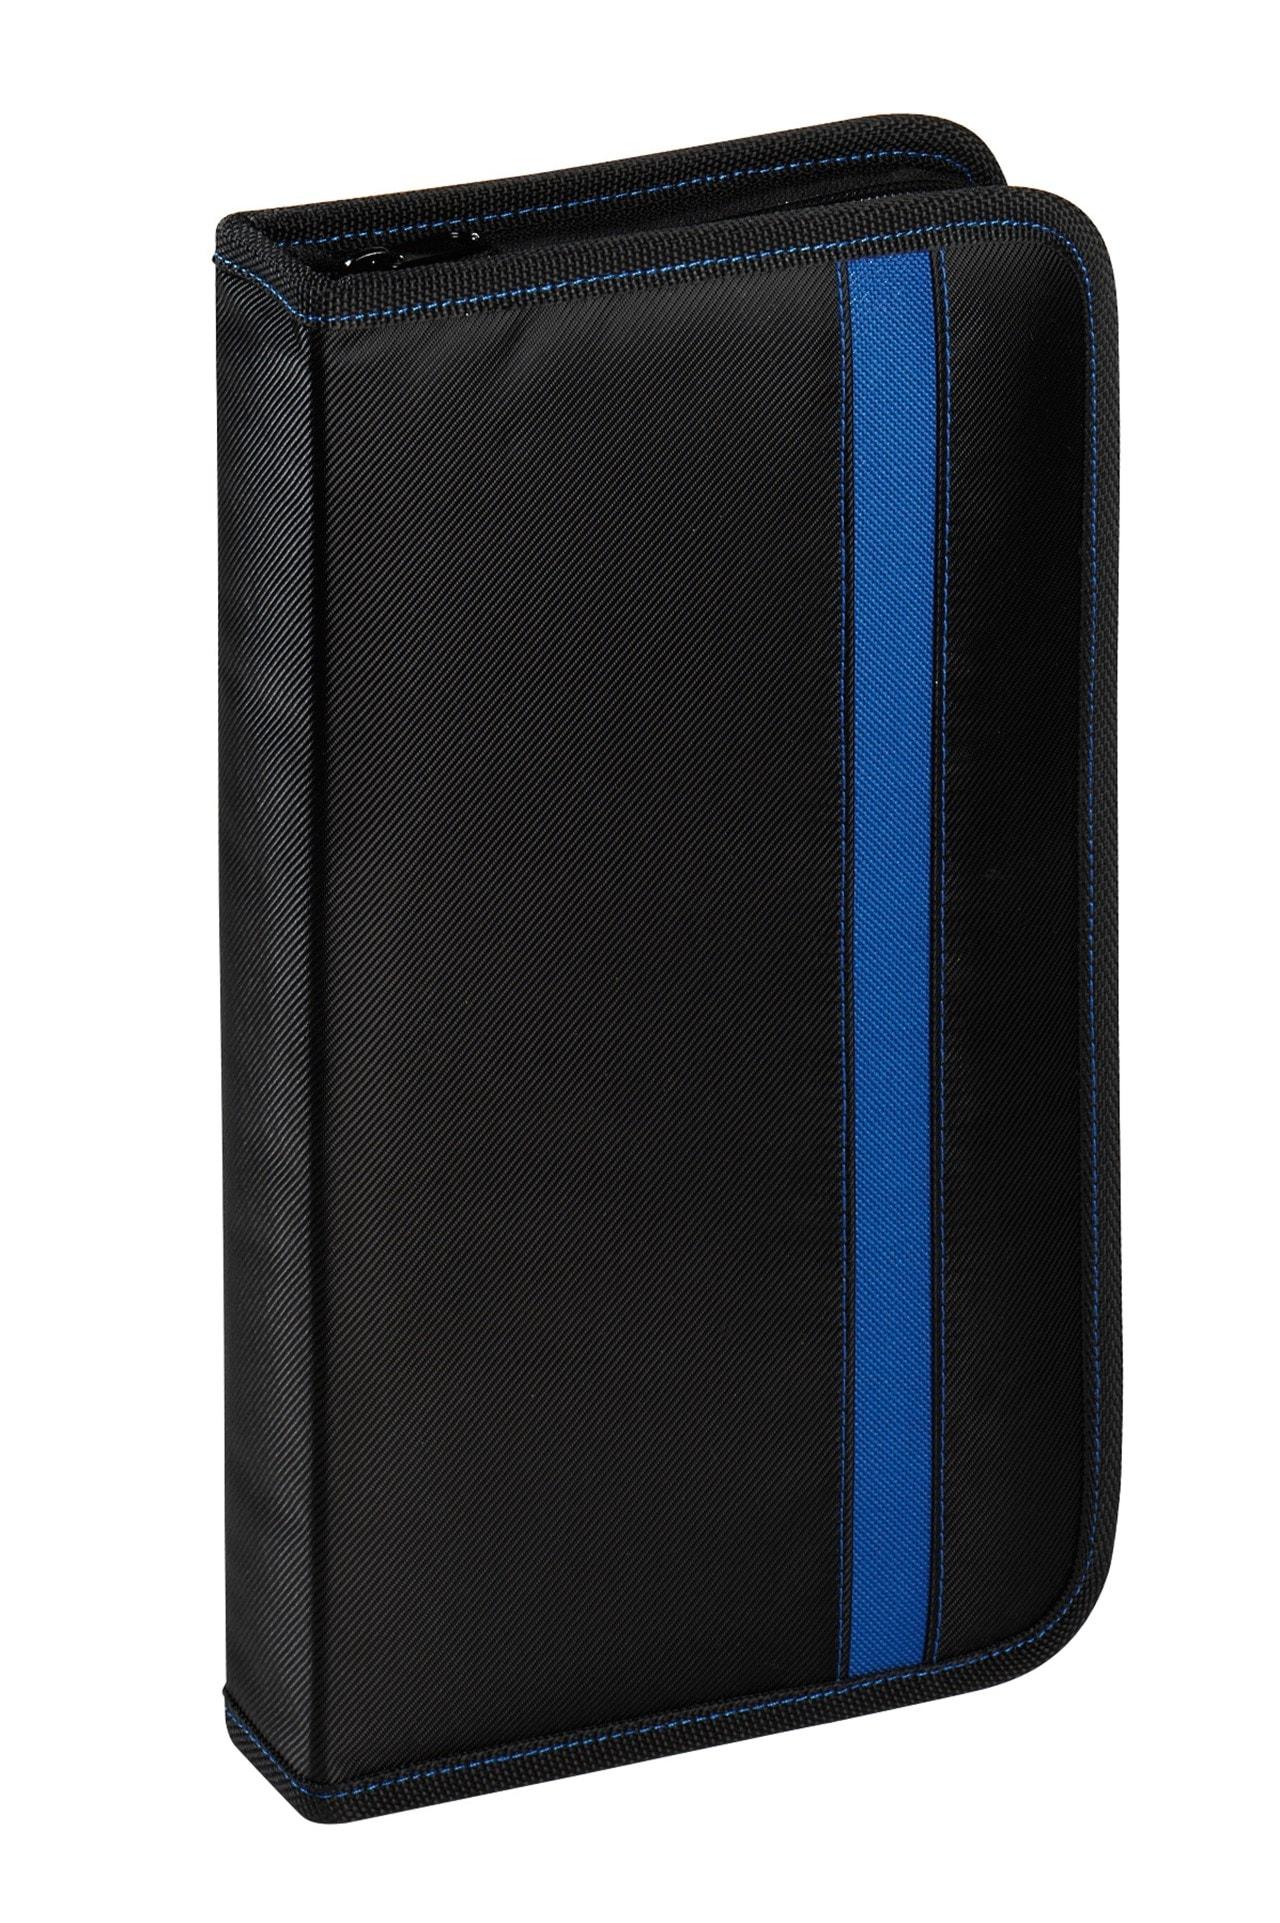 Vivanco 48 CD Wallet Black/Blue - 1